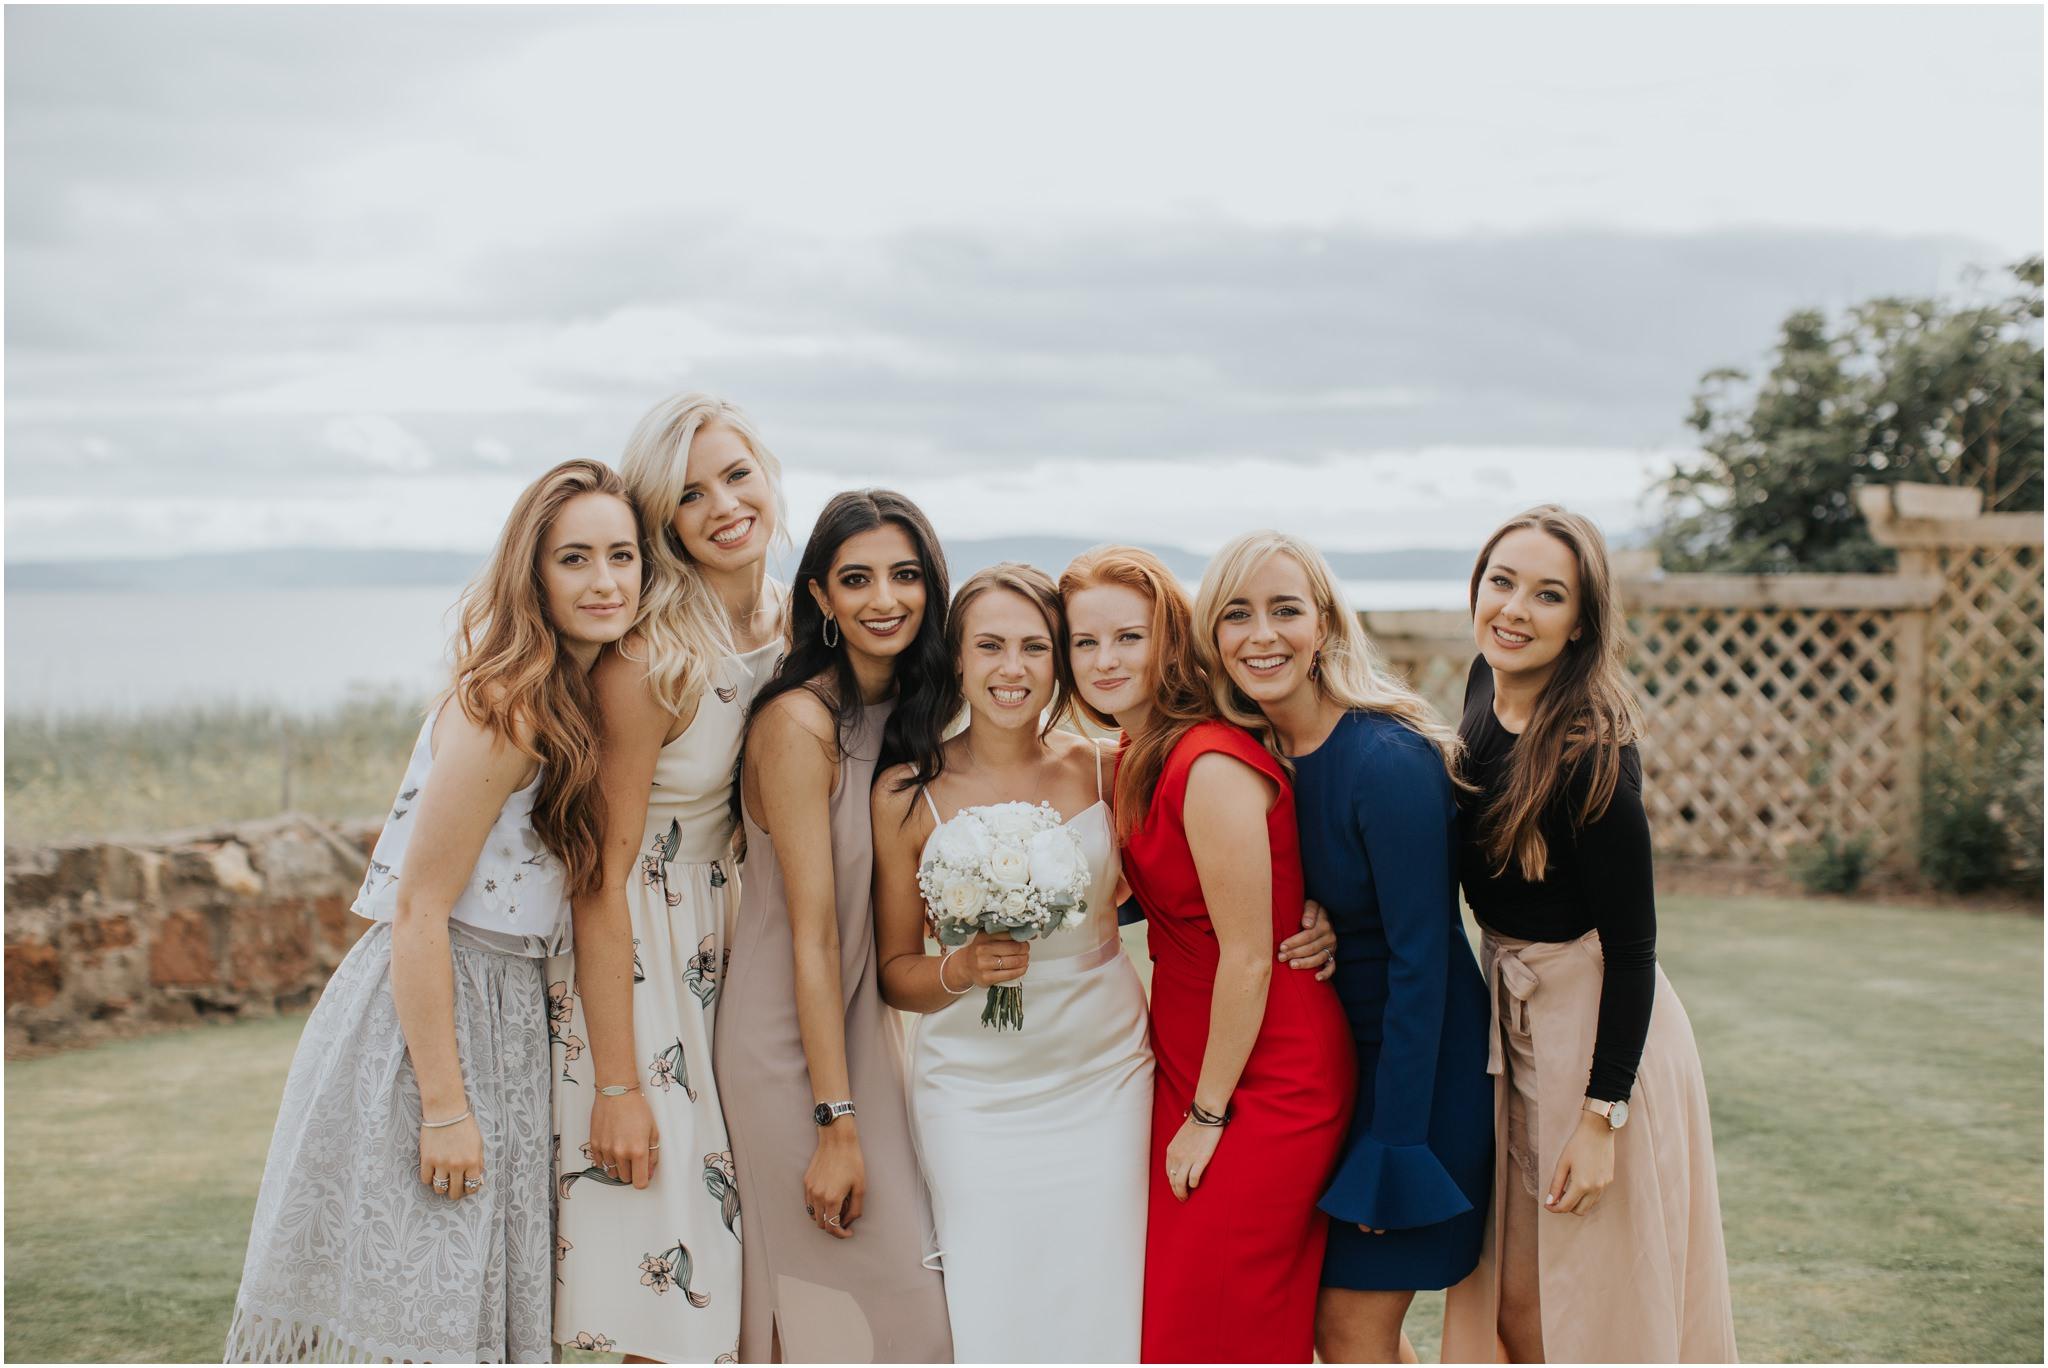 Photography 78 - Glasgow Wedding Photographer - Jordan & Abi - The Waterside Hotel, West Kilbride_0098.jpg